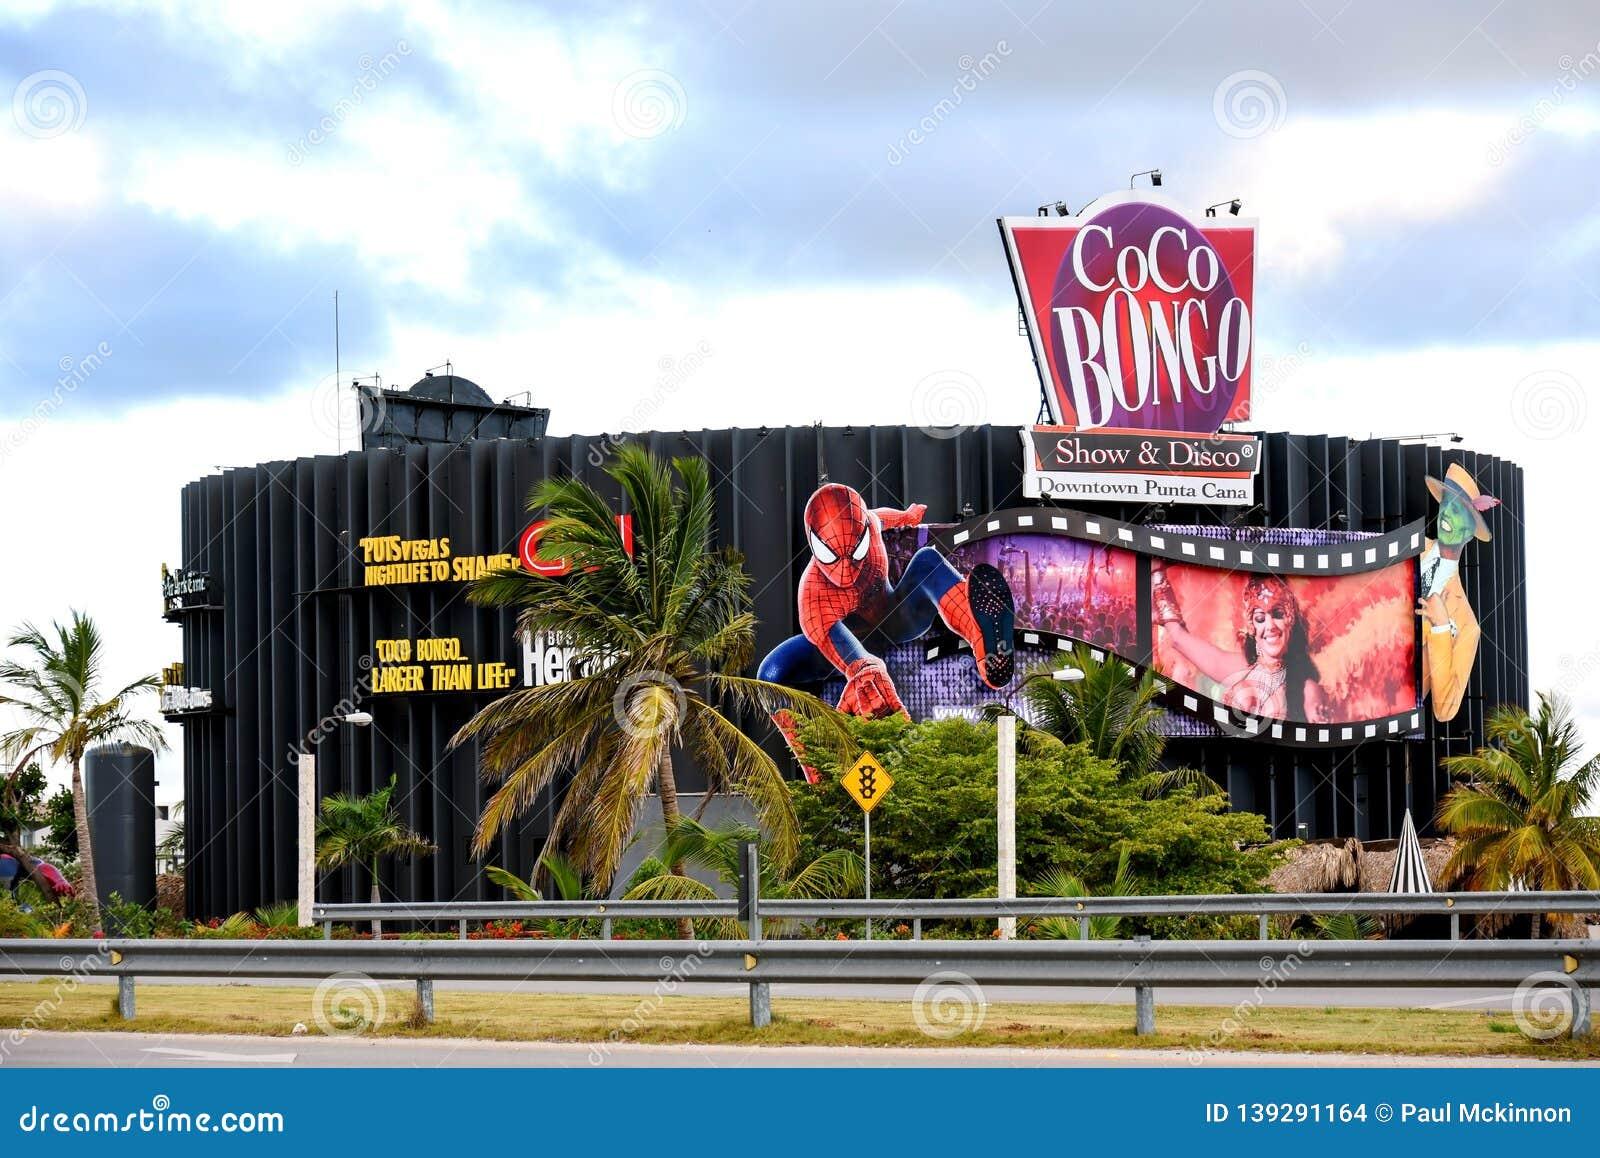 Coco Bongo Club In Punta Cana, Dominican Republic Editorial Stock